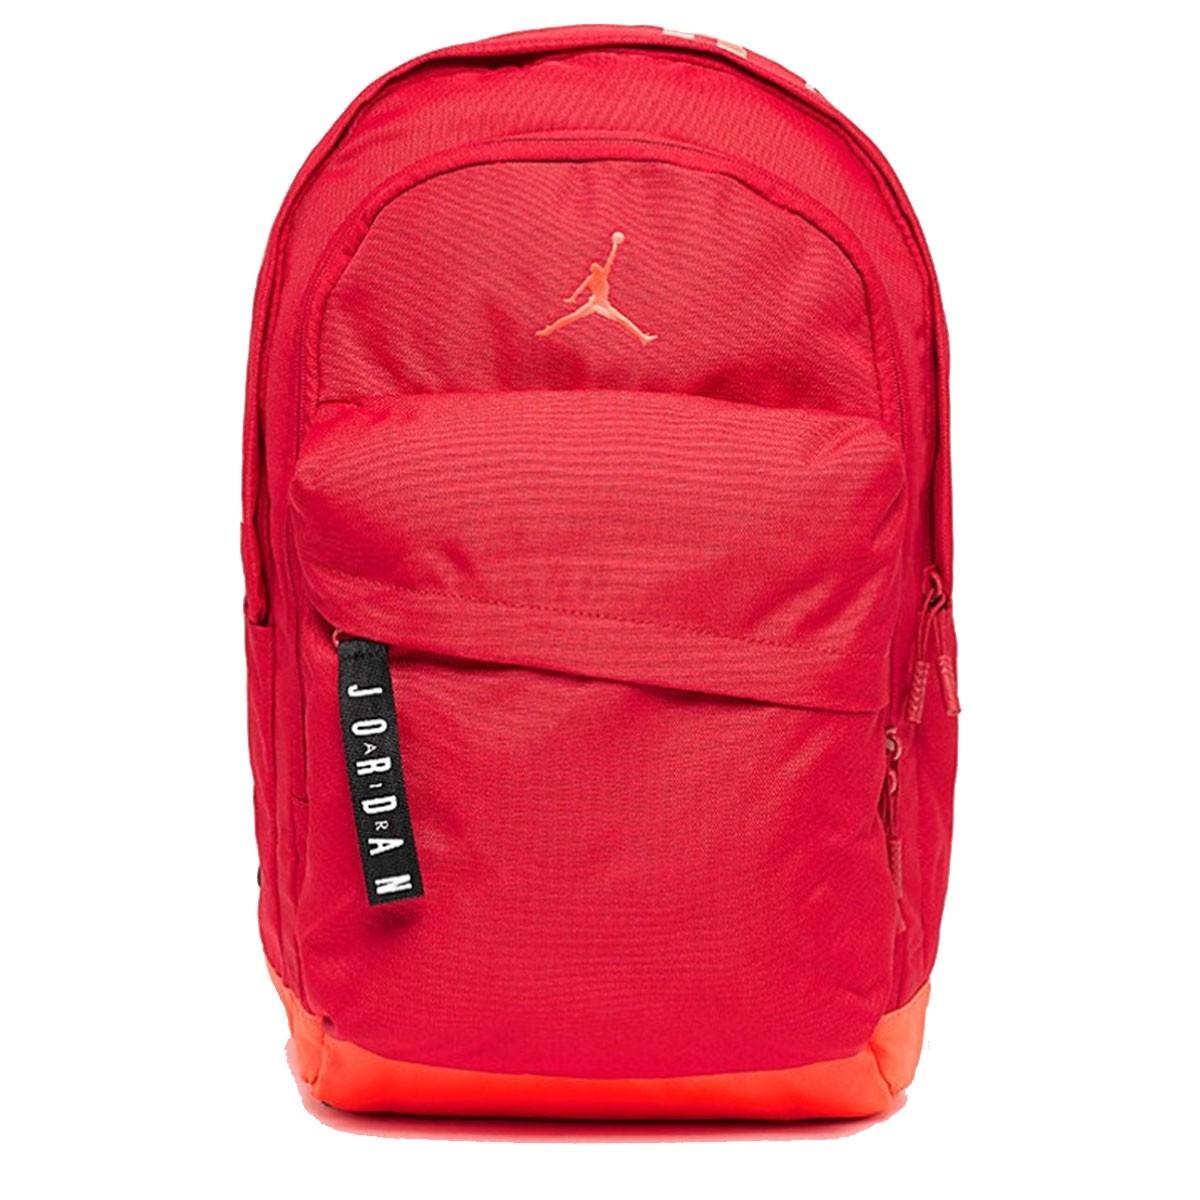 Jordan Air Patrol Backpack 'Red'